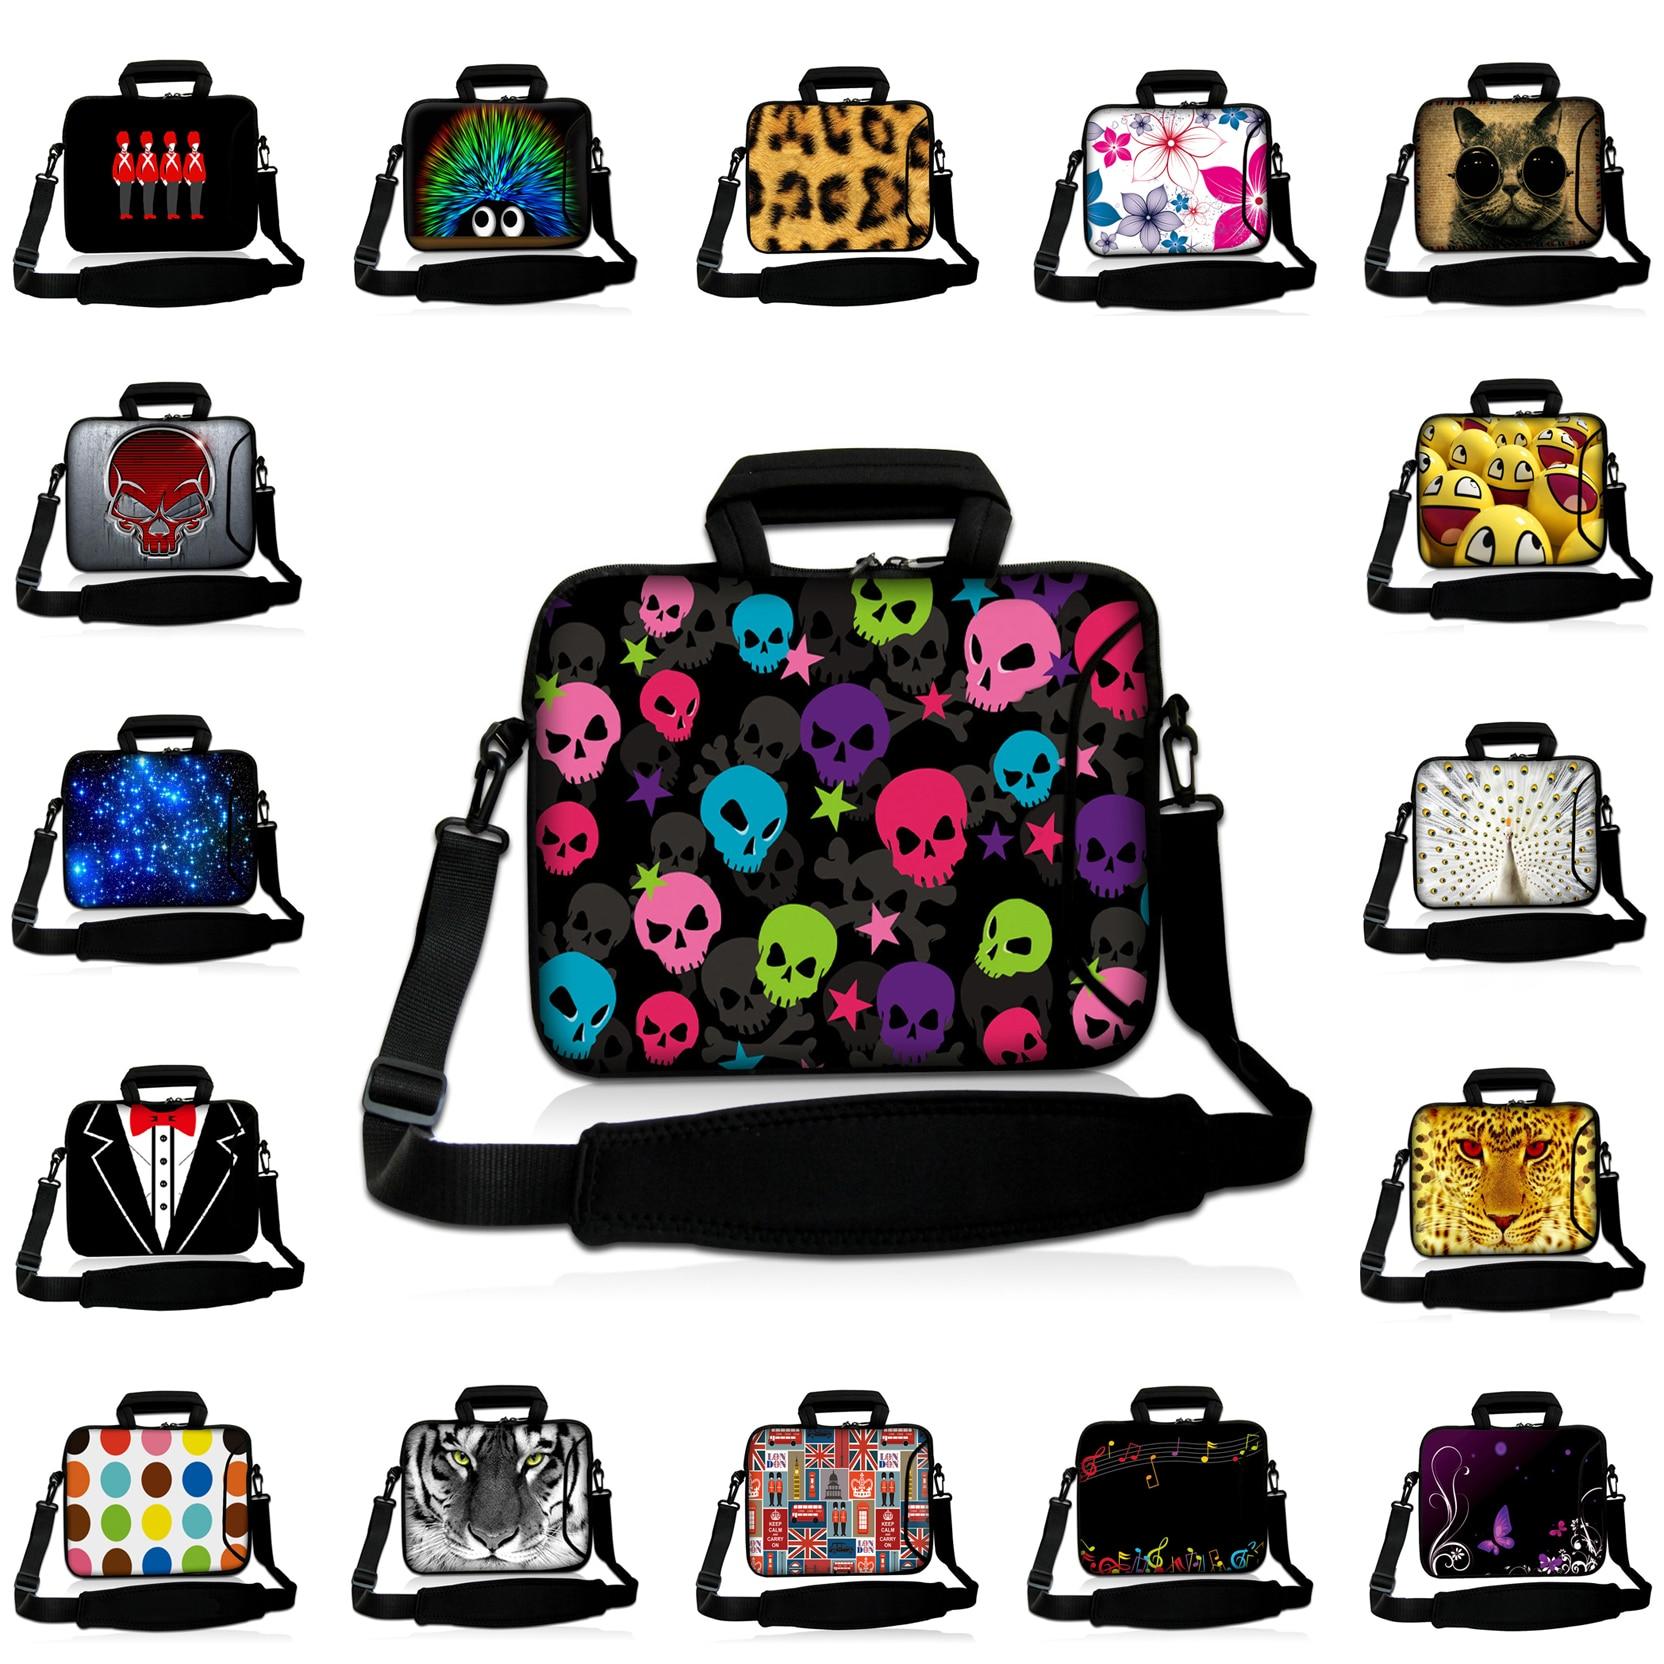 73e8090e78f3 ... New Messenger Notebook Bag For Sony Vaio Chuwi hi10 Acer+Shoulder Strap  · Laptop Case 14 Inch Women s Soft Shoulder Bag 13 15 17 9.7 12 10 Inch  Neoprene